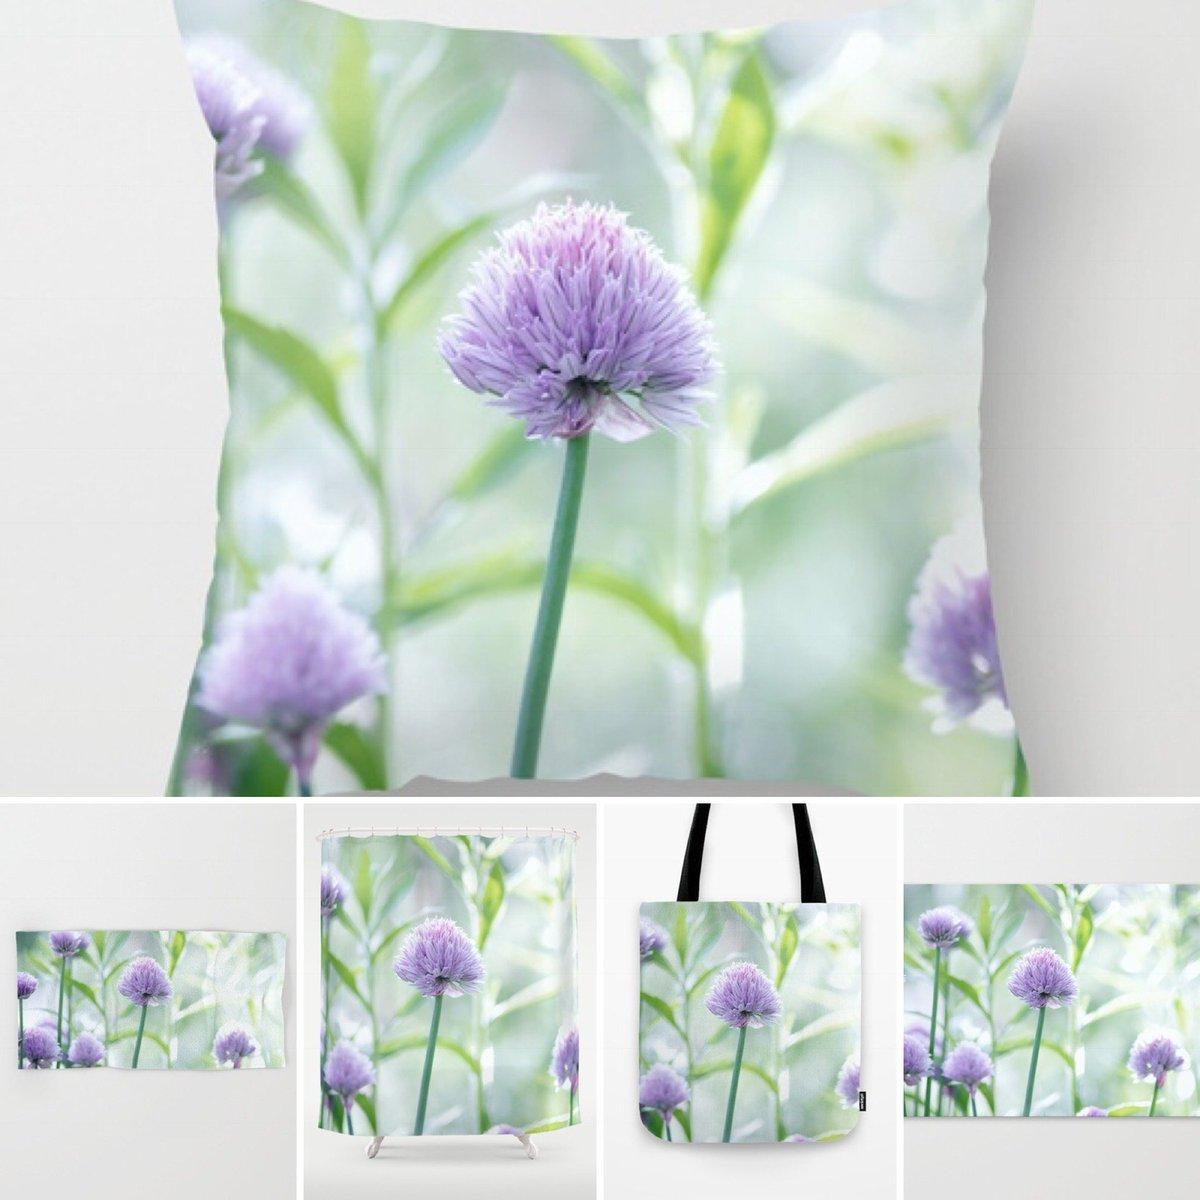 Free shipping off everything today  https:// society6.com/product/garden -nature_pillow?#s6-7070318p26a18v126a25v193 &nbsp; …  #interior #interiores #garten #garden #allium<br>http://pic.twitter.com/jOjrDpLBWP